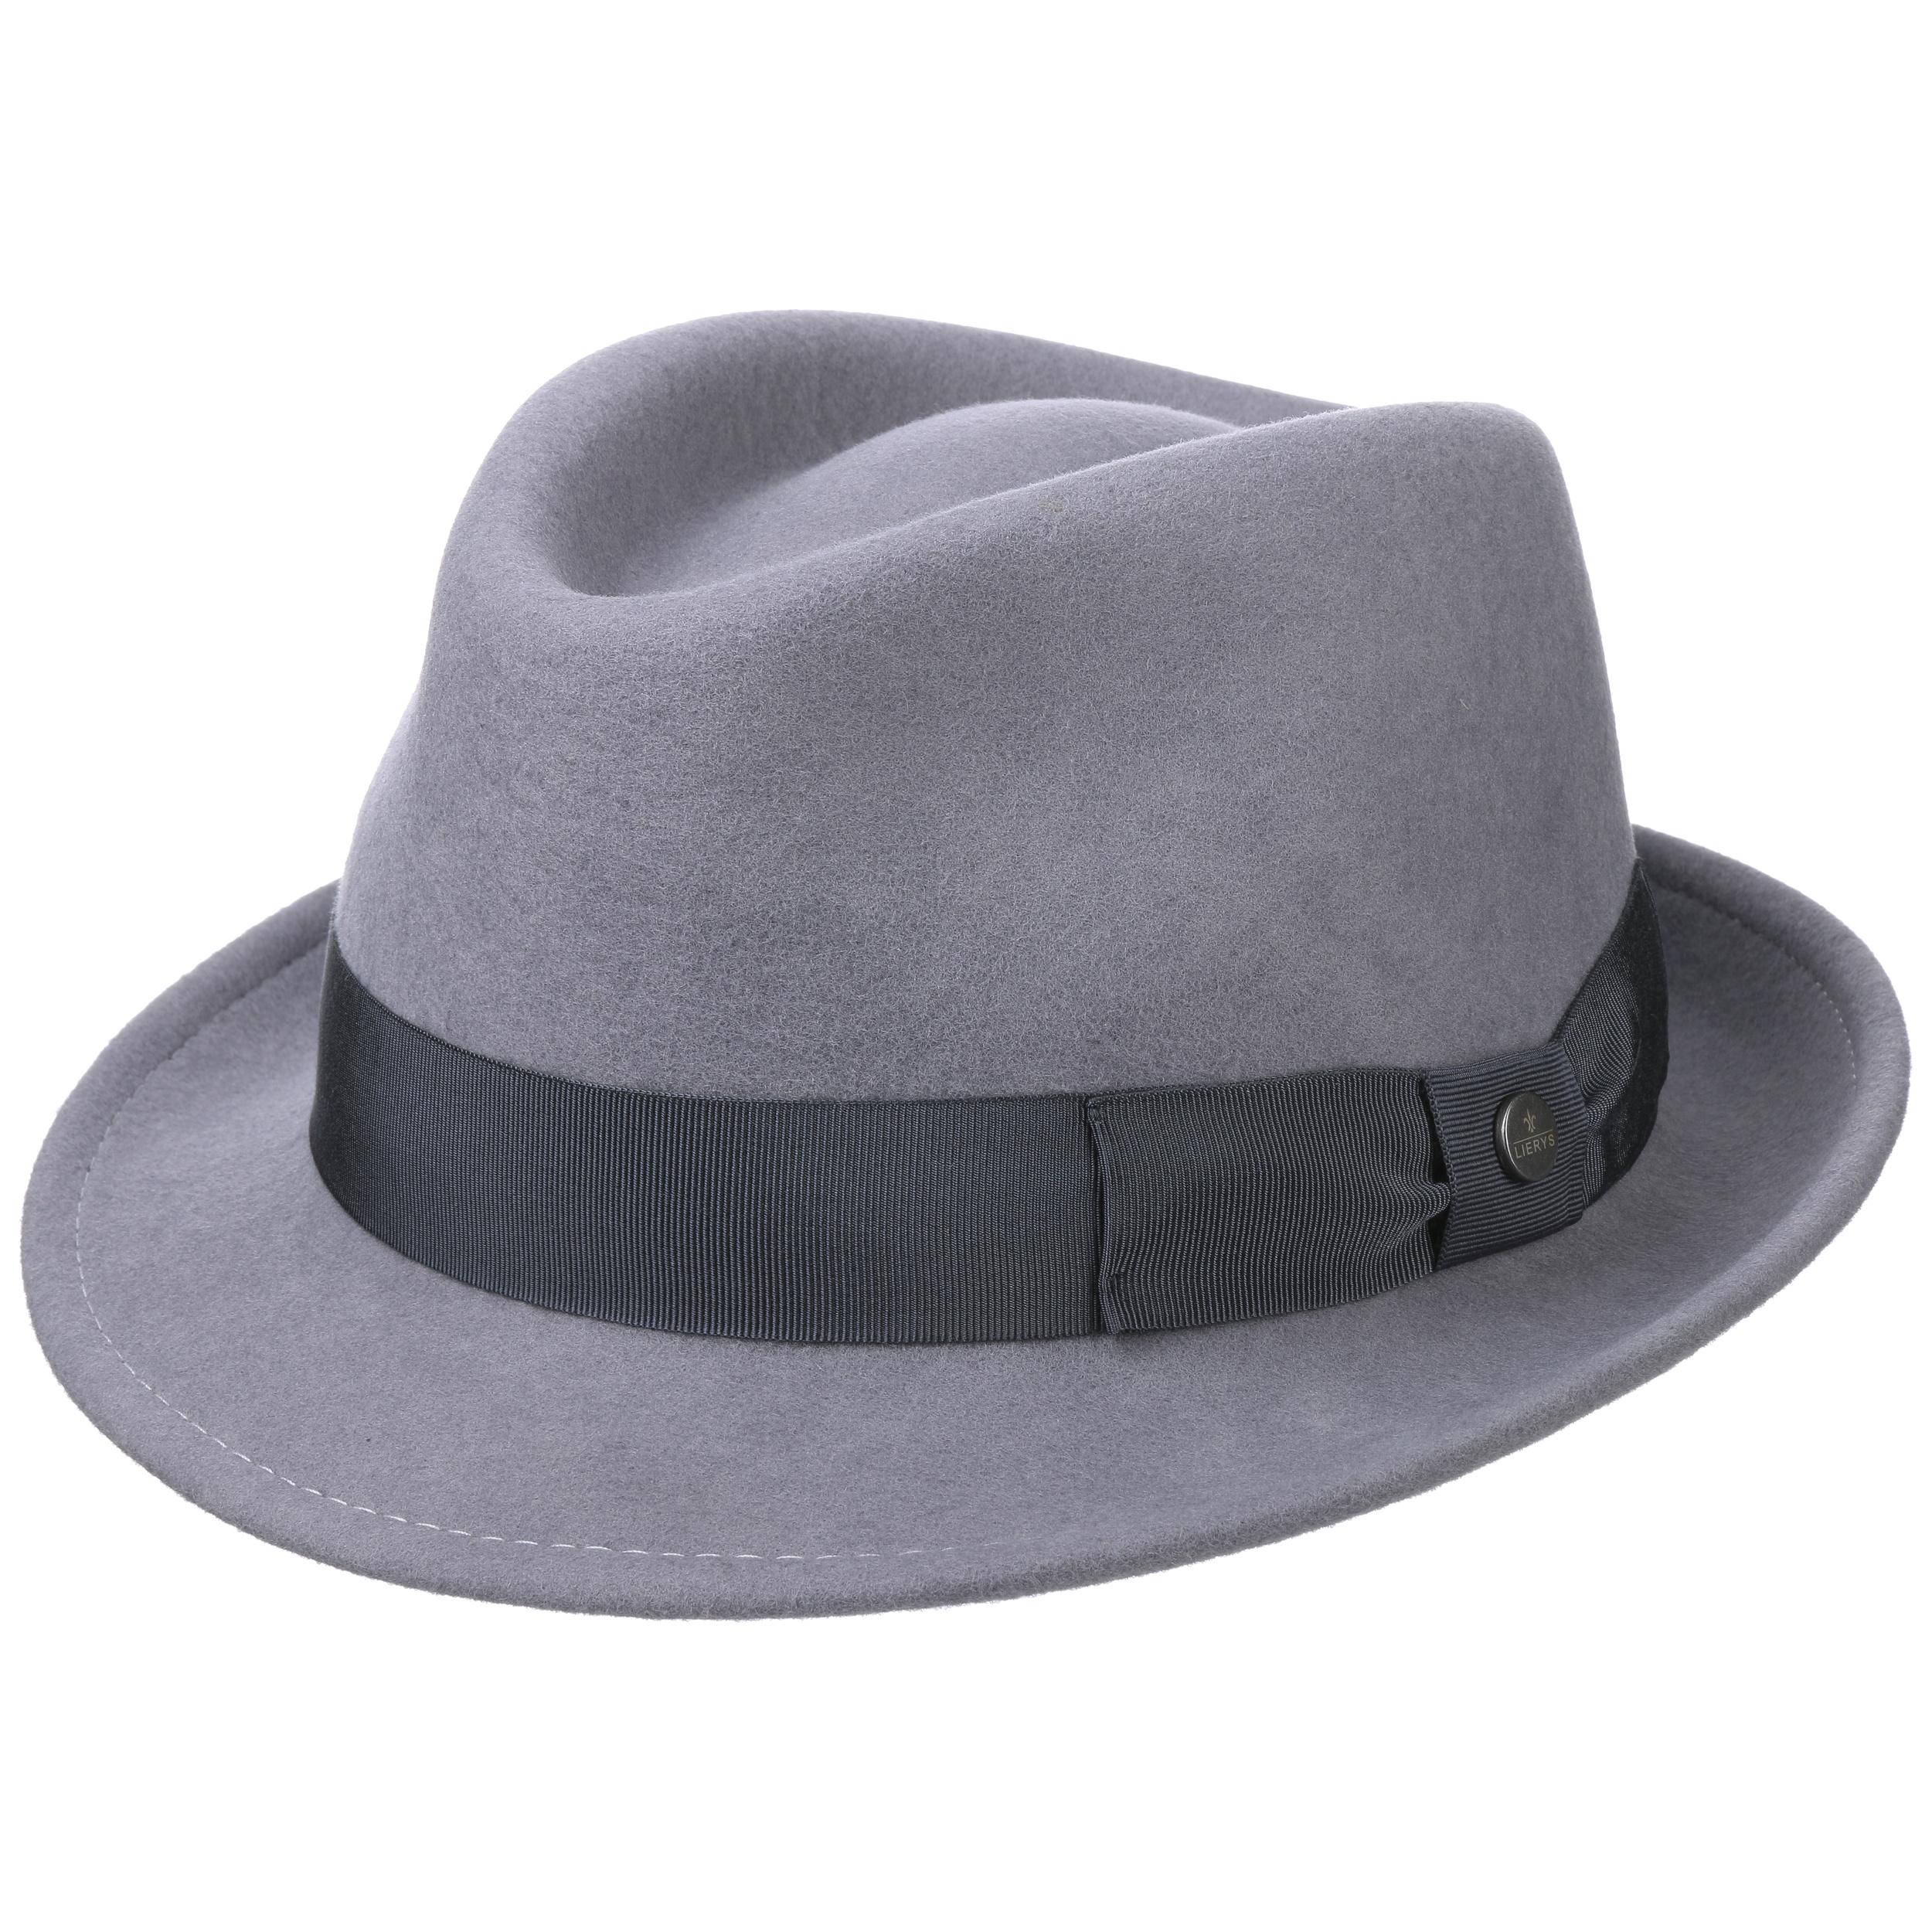 ... Classic Wool Trilby Hat by Lierys - blue 4 ... c0bc5af62ad